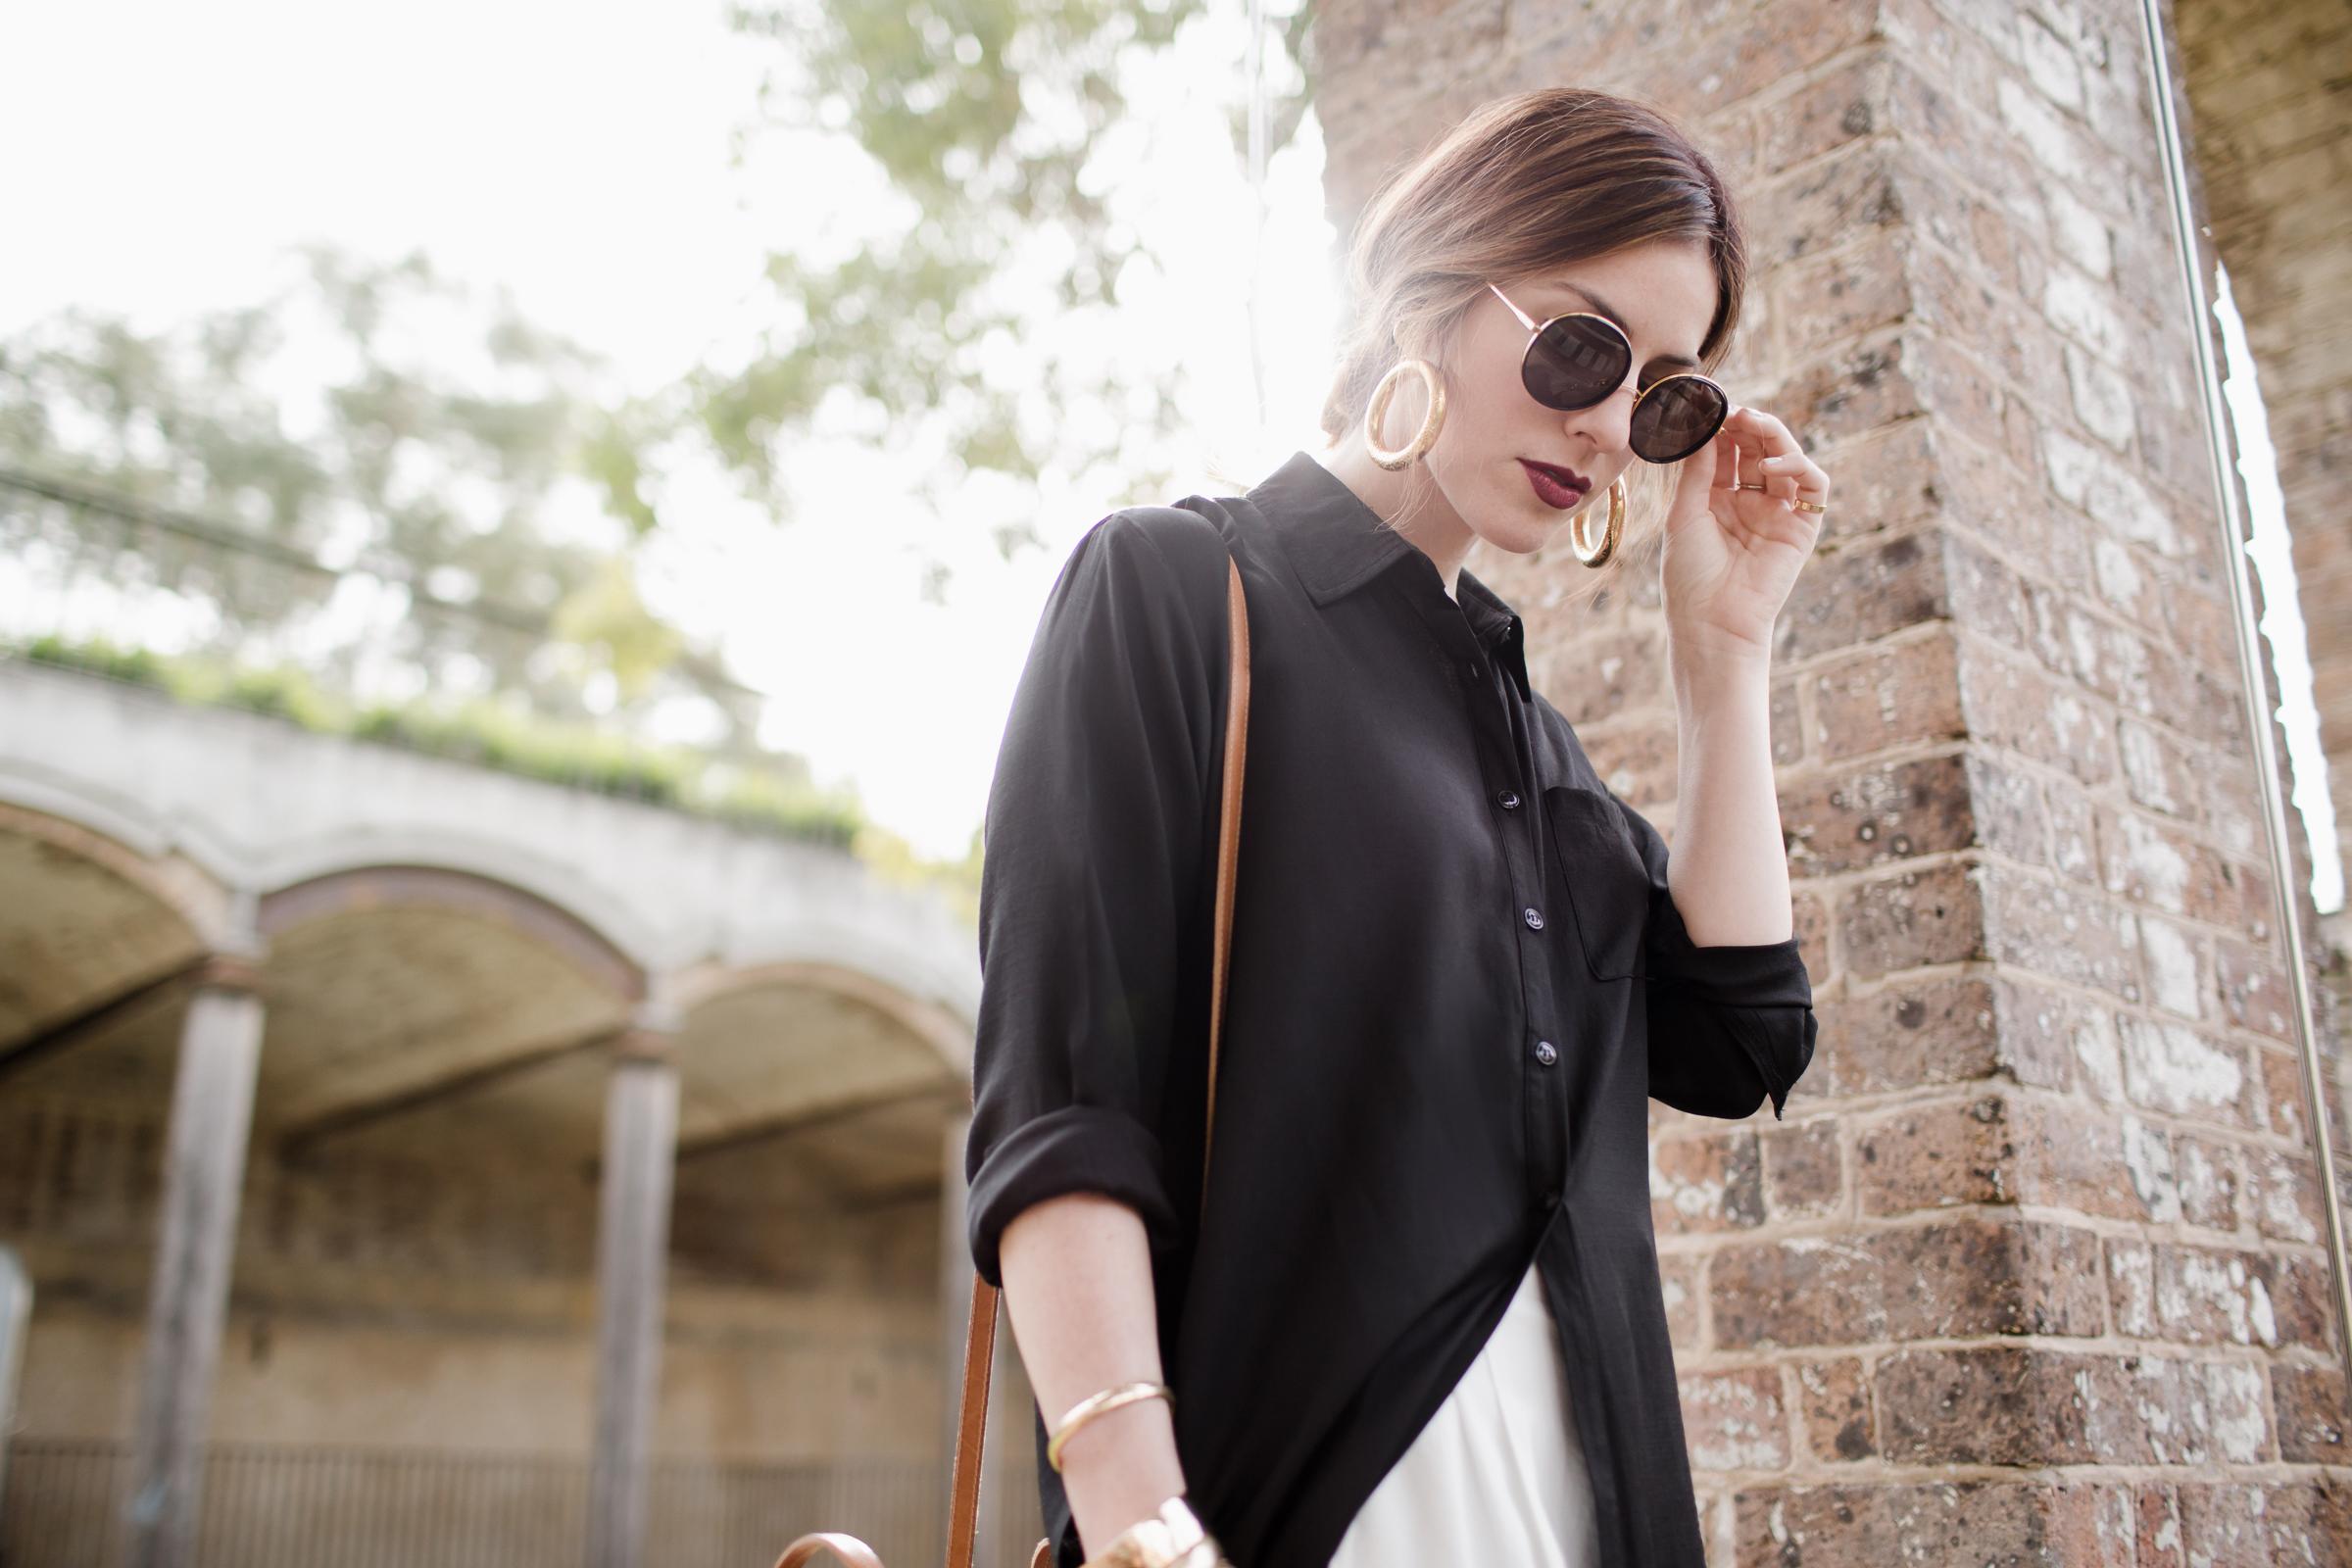 Eldridge_Edit_Anna_E_Cottrell_Fashion_Blogger_Tulip_Louise_MGB_Photo_Mercedes_Benz_Fashion_Week_Australia_Kitx_Presentation_Resort_Shop_Lola_Boutique_Chic_7.jpg